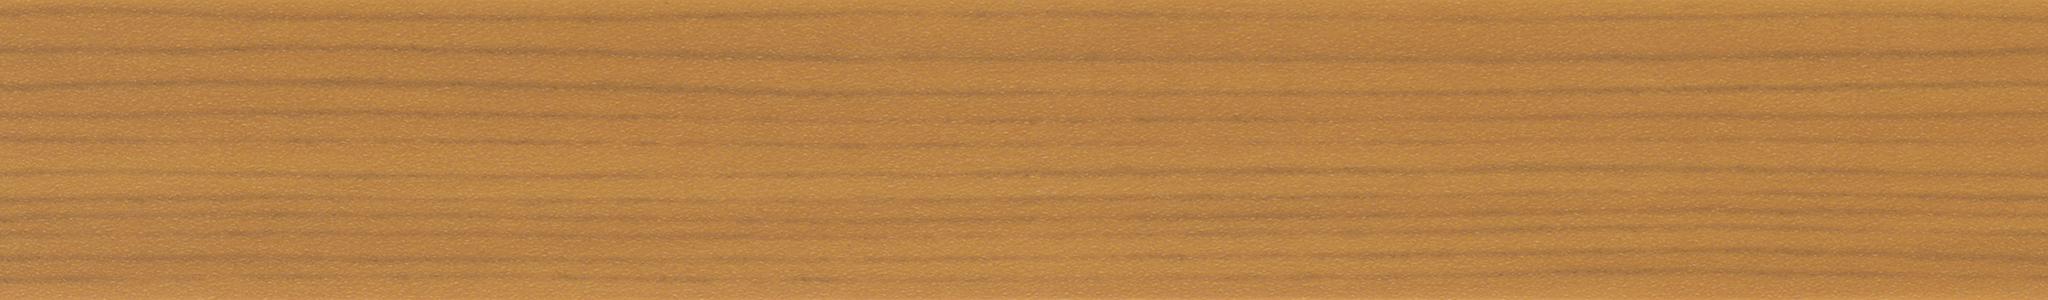 HD 221705 ABS hrana třešeň perla